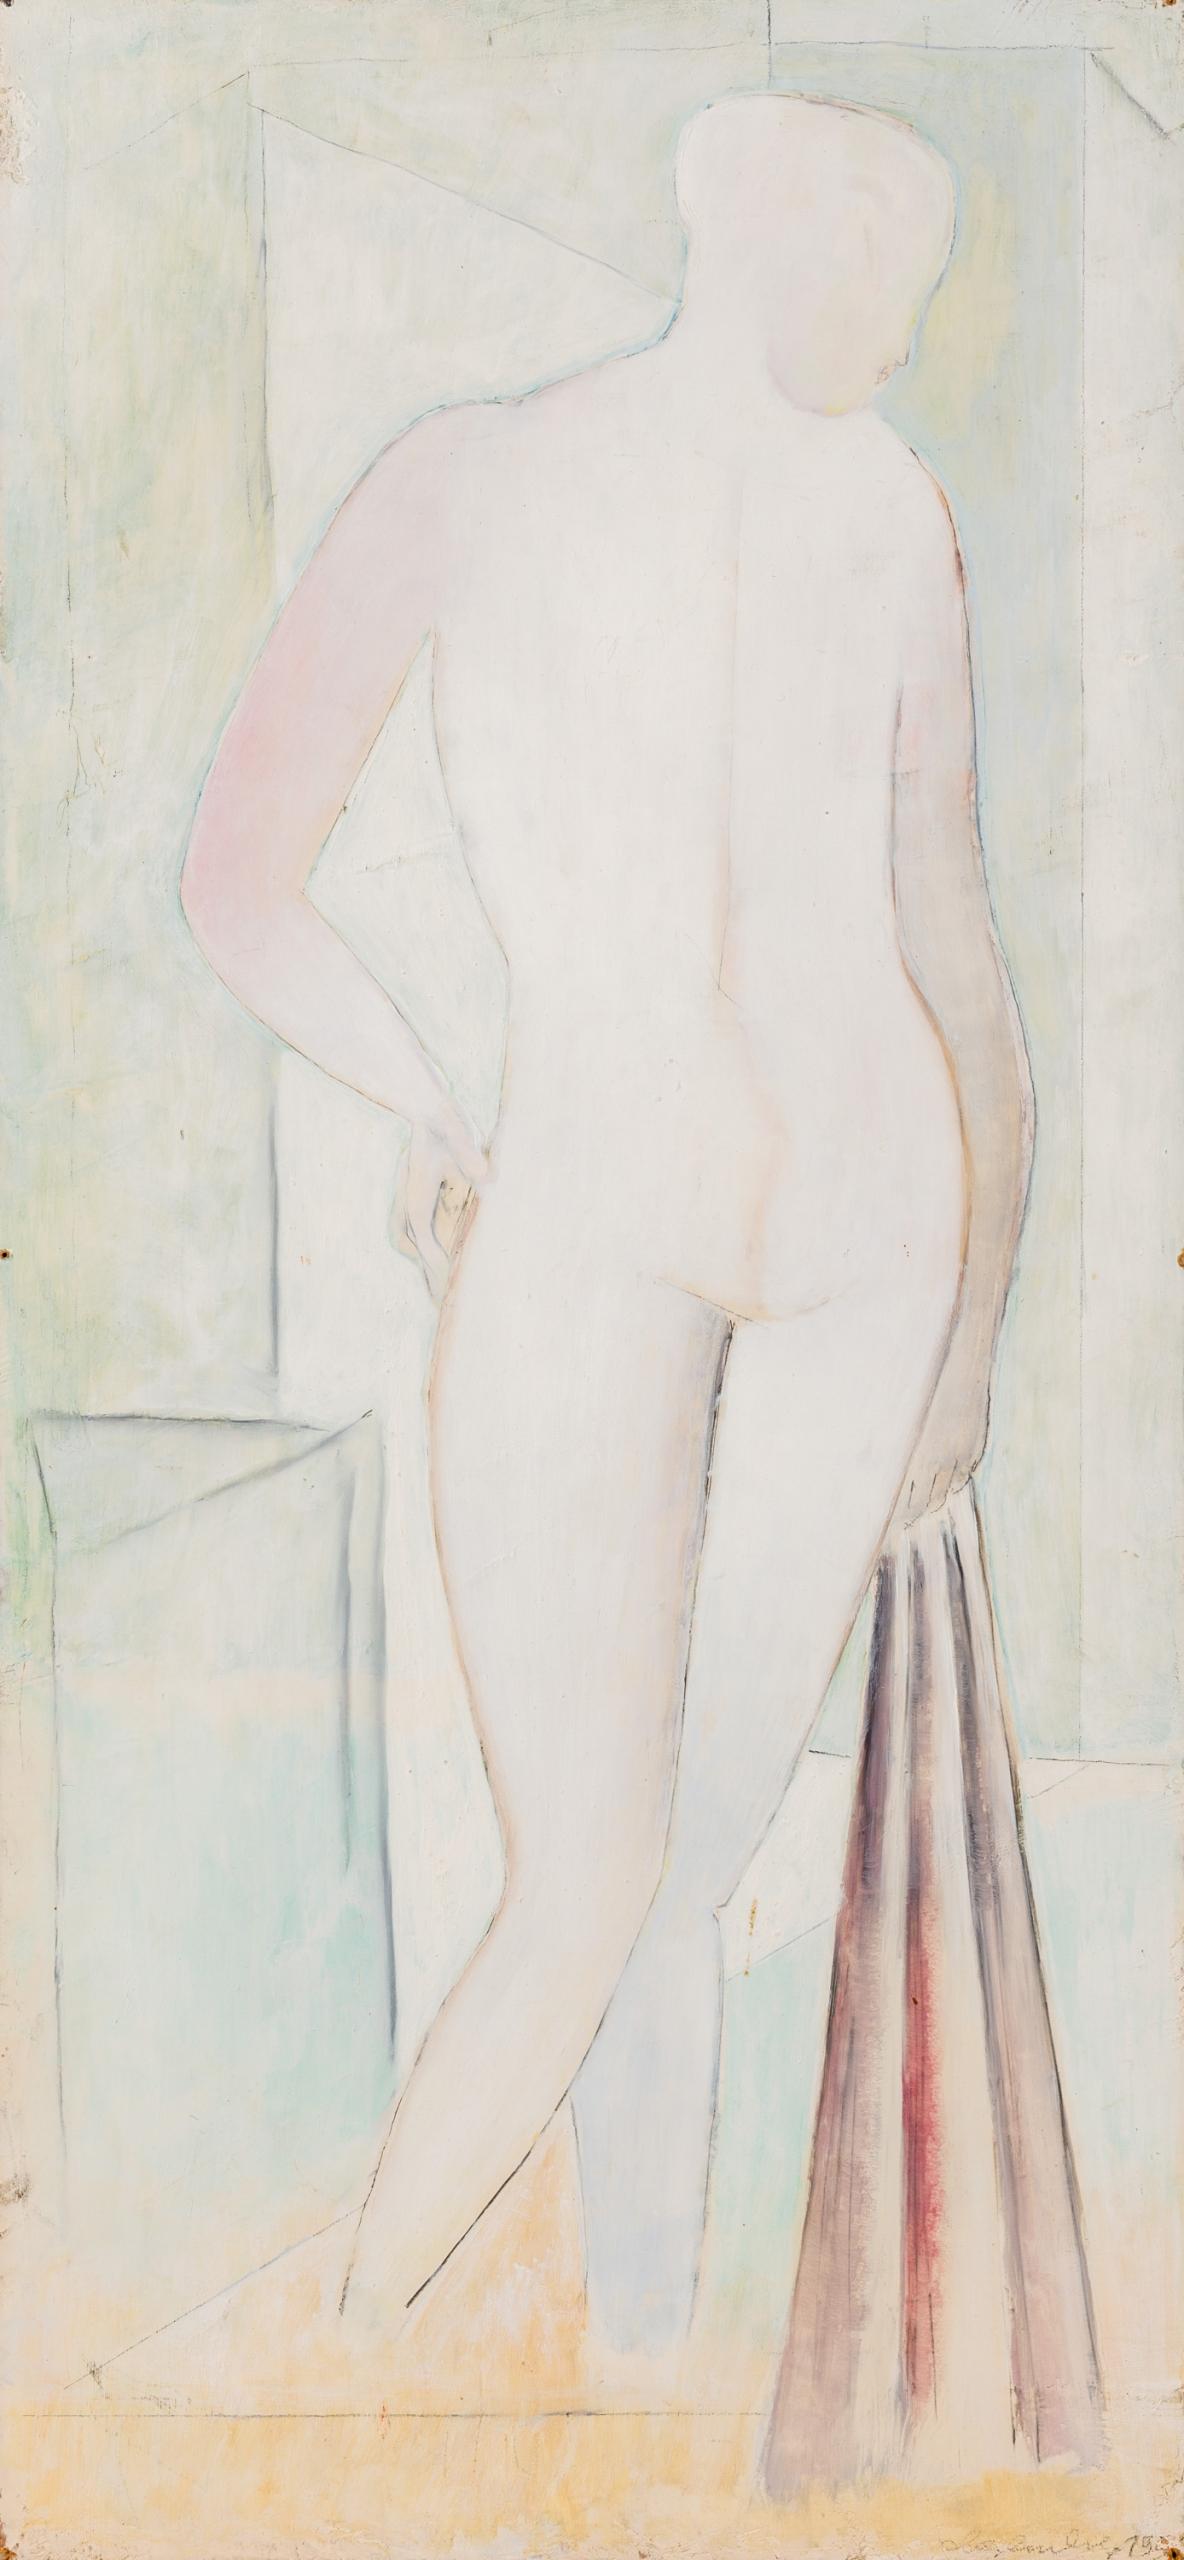 Oswald Oberhuber, Ohne Titel